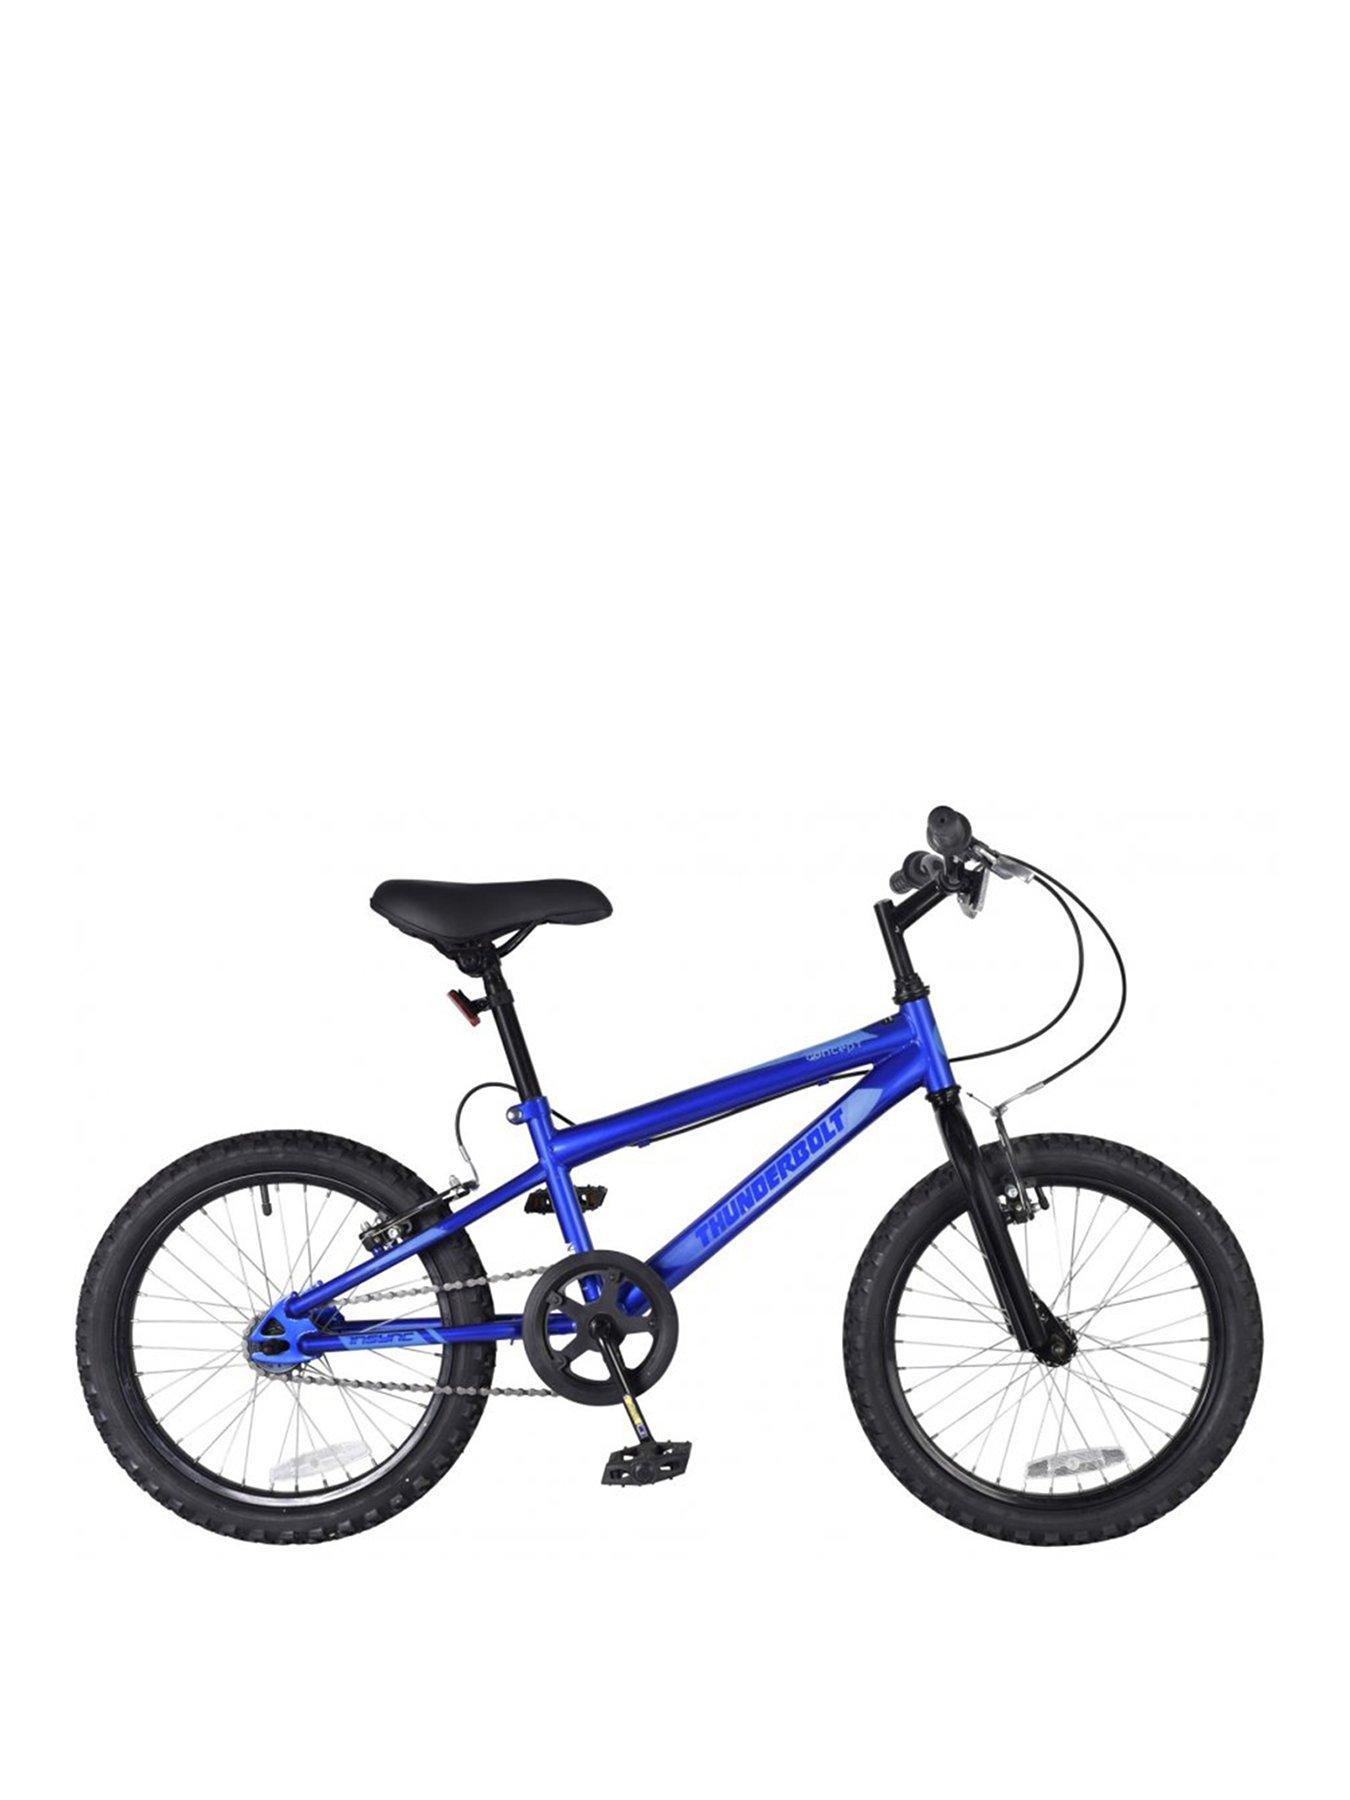 Rooster Core 9.5 Frame 18 Wheel Boys BMX Bike Blue